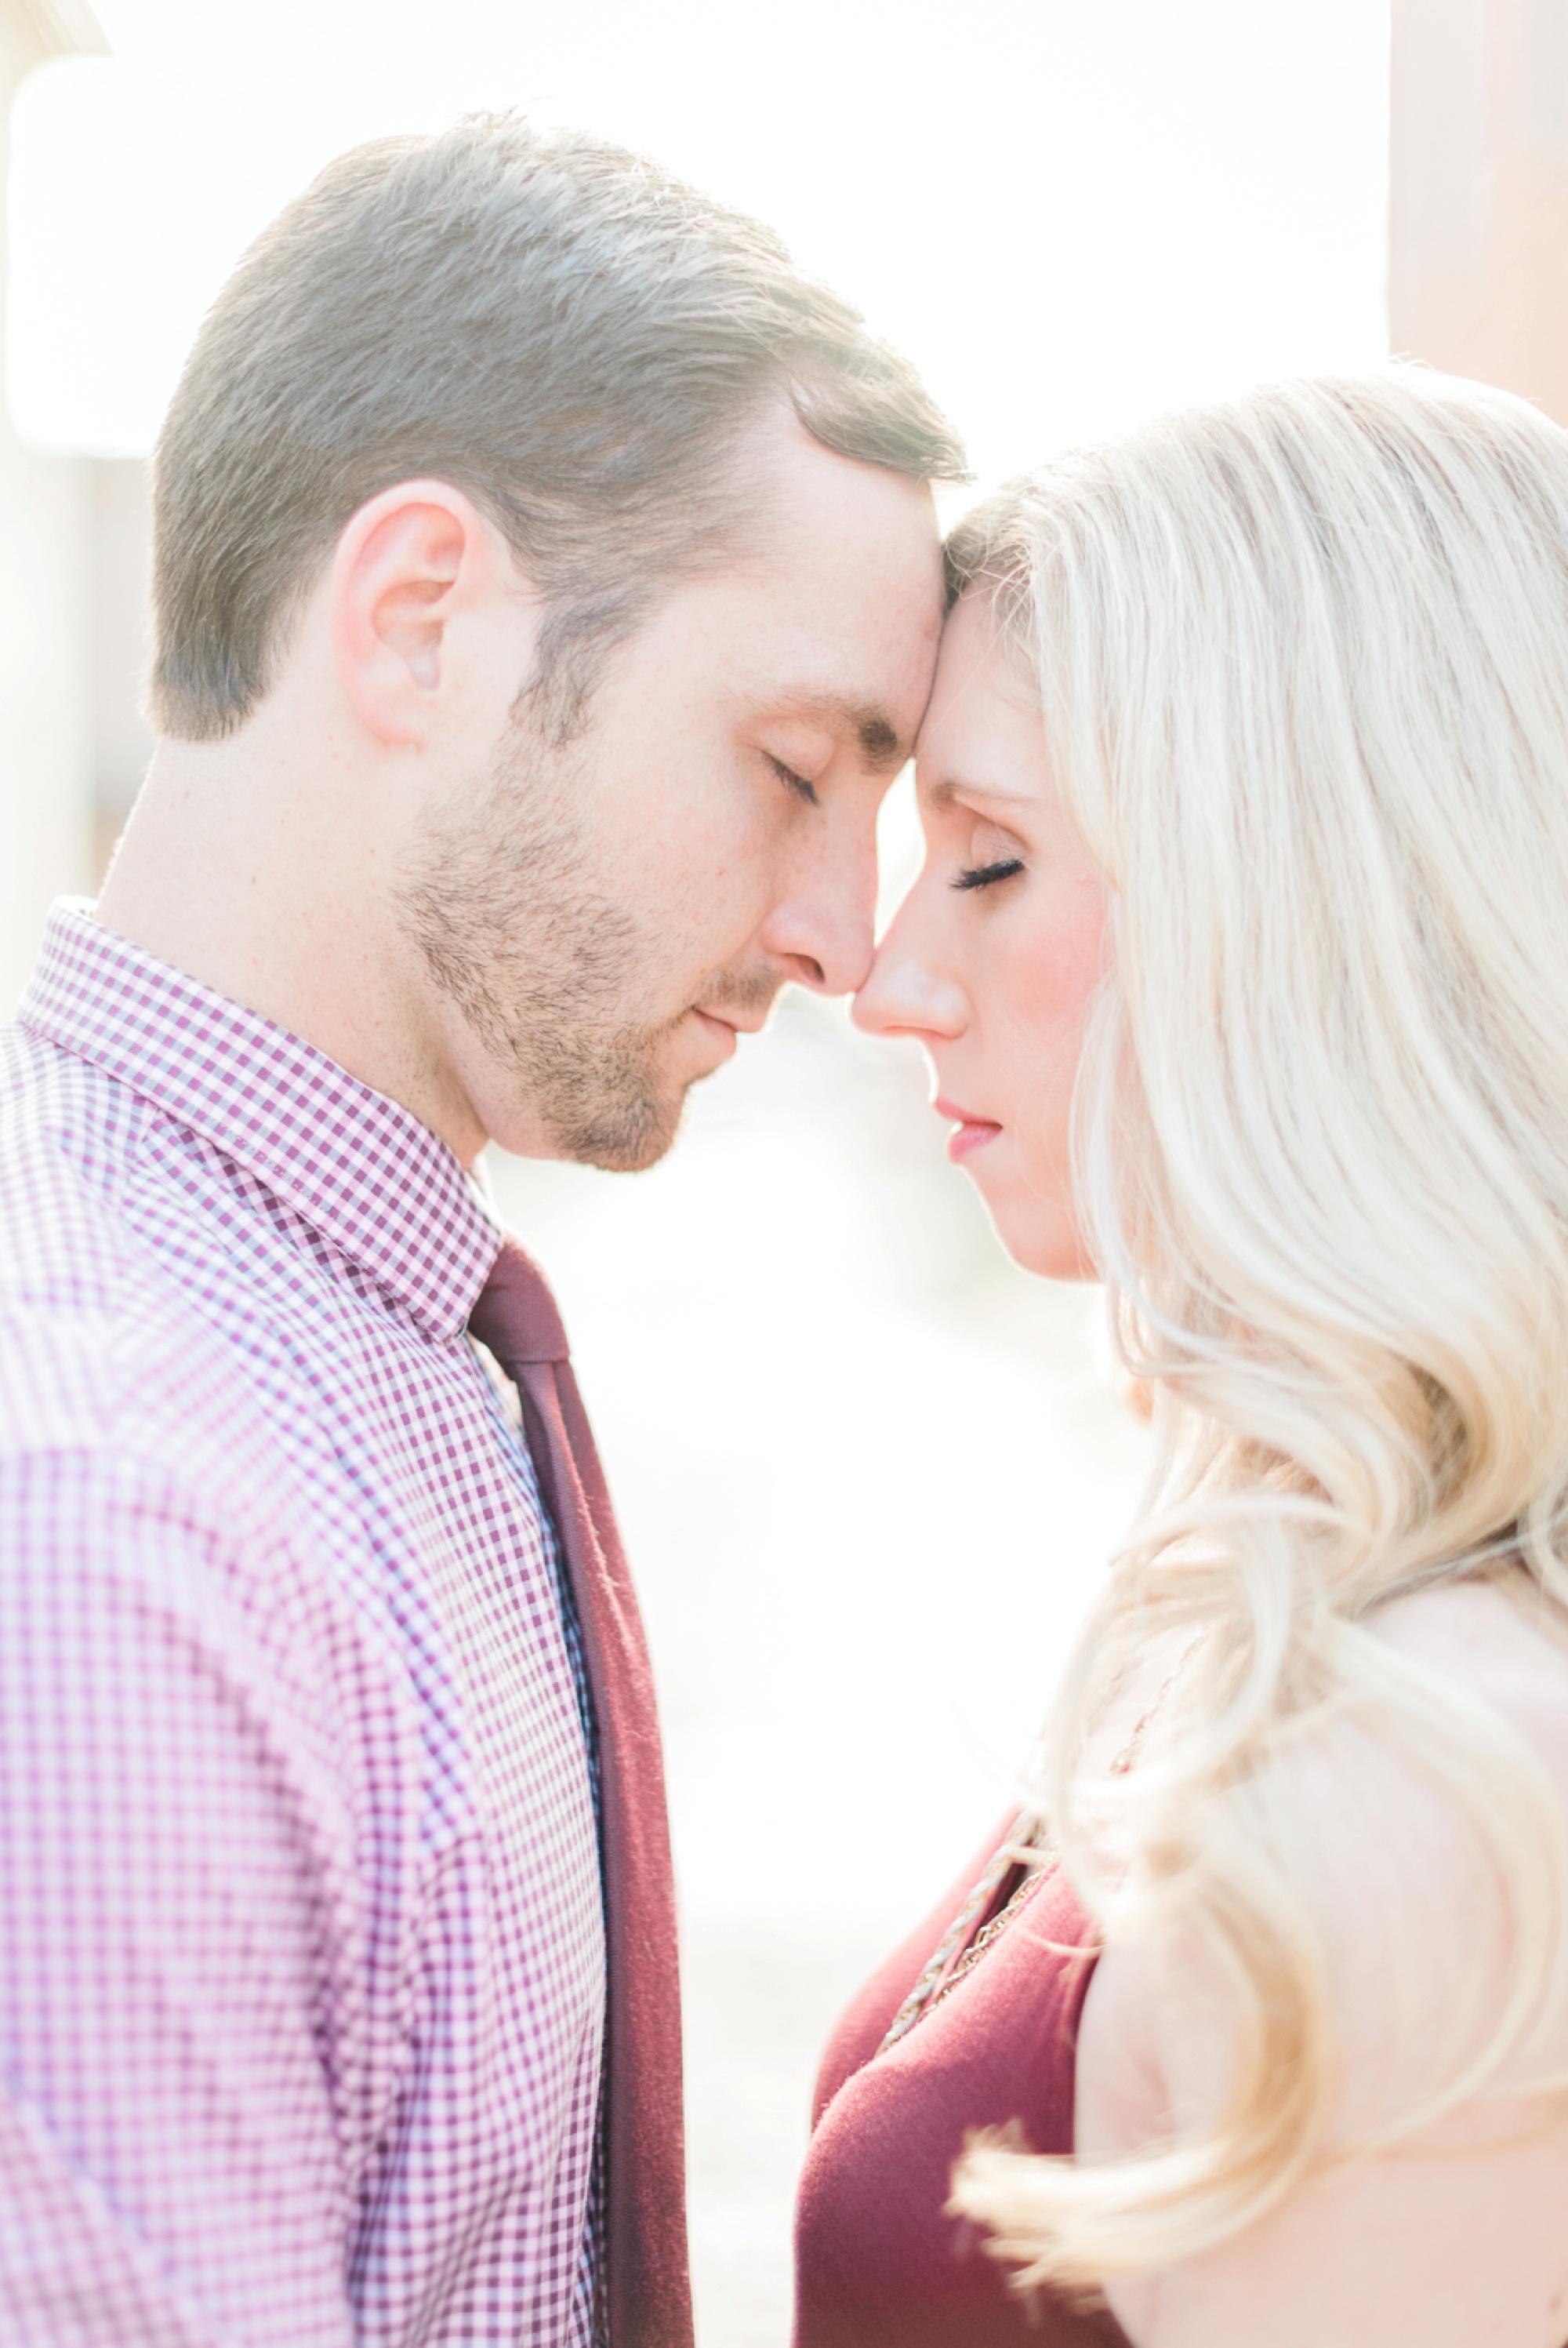 german-village-engagement-session-columbus-ohio-wedding-photographer-25.jpg